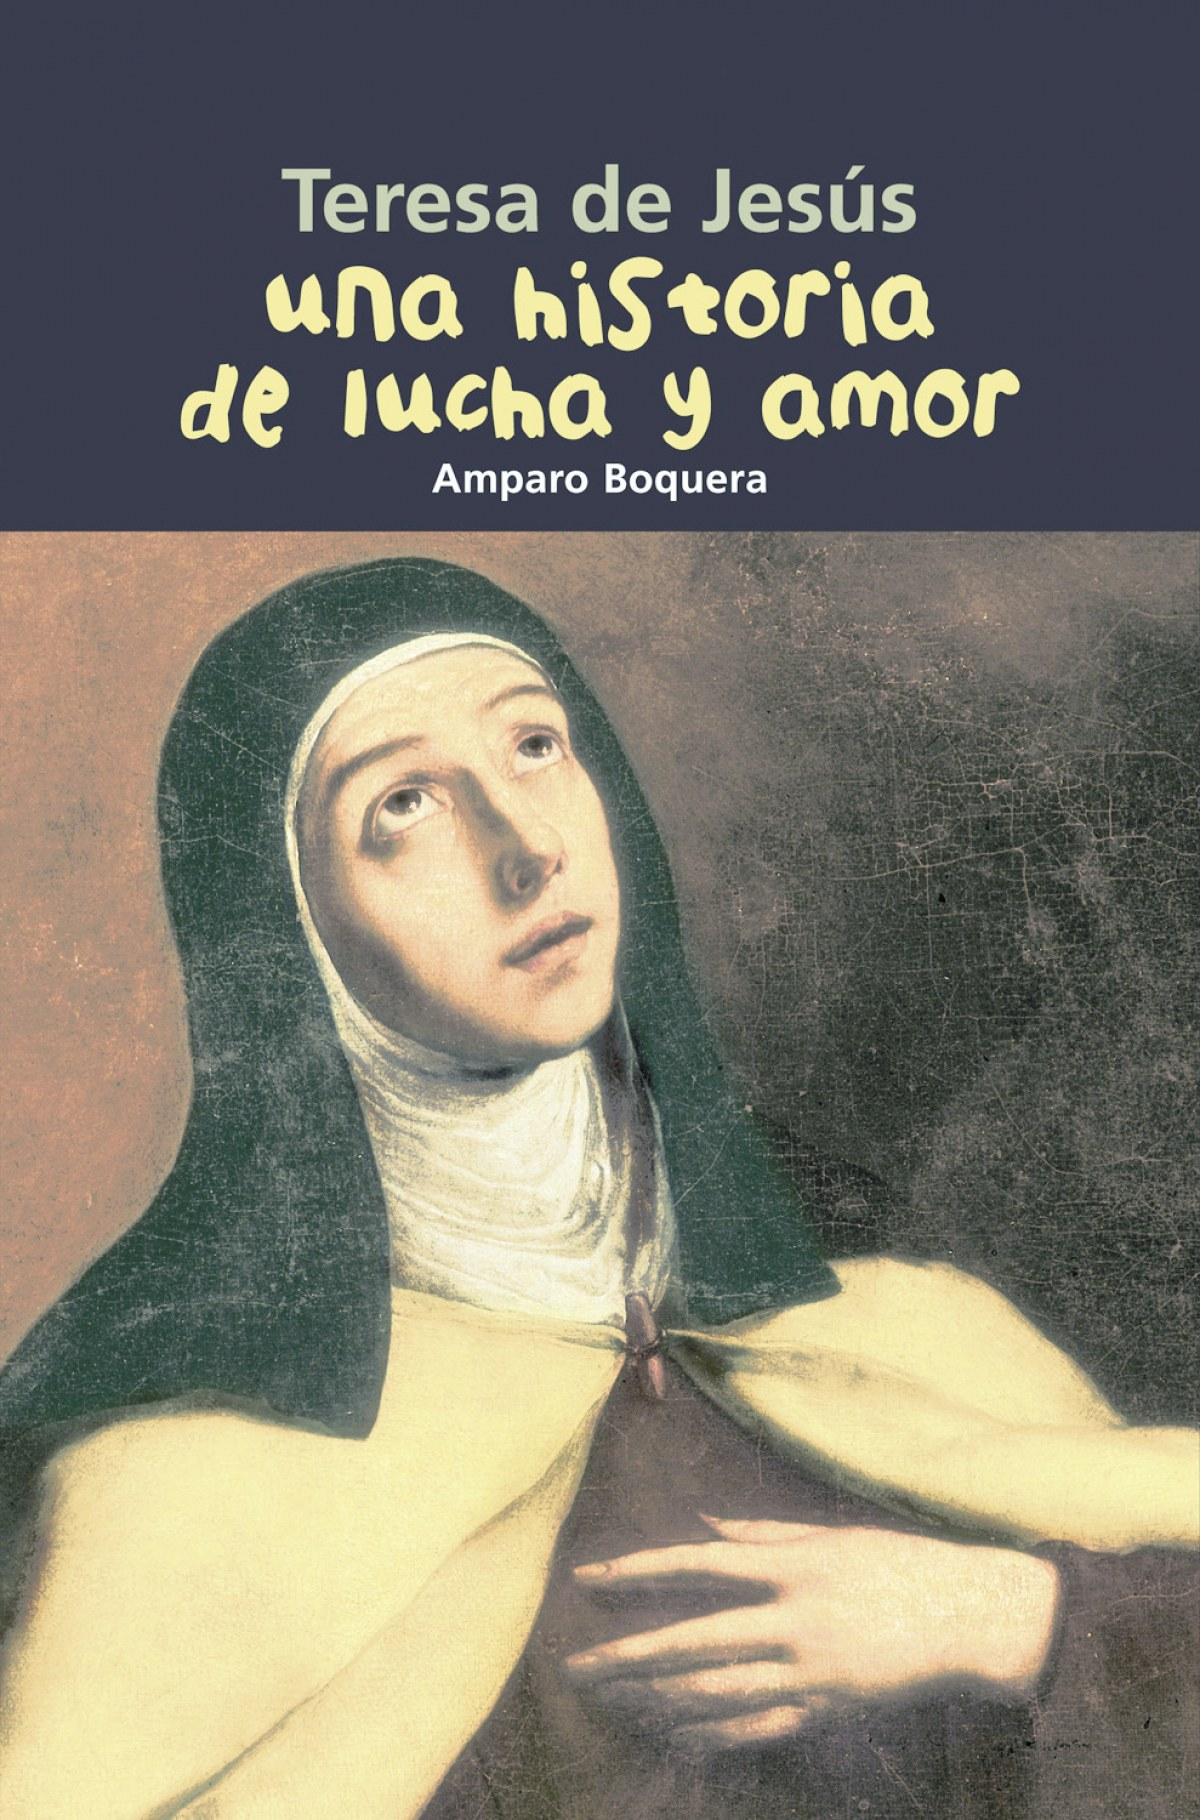 Historia de lucha y amor. Teresa de Jesús 9788421843369